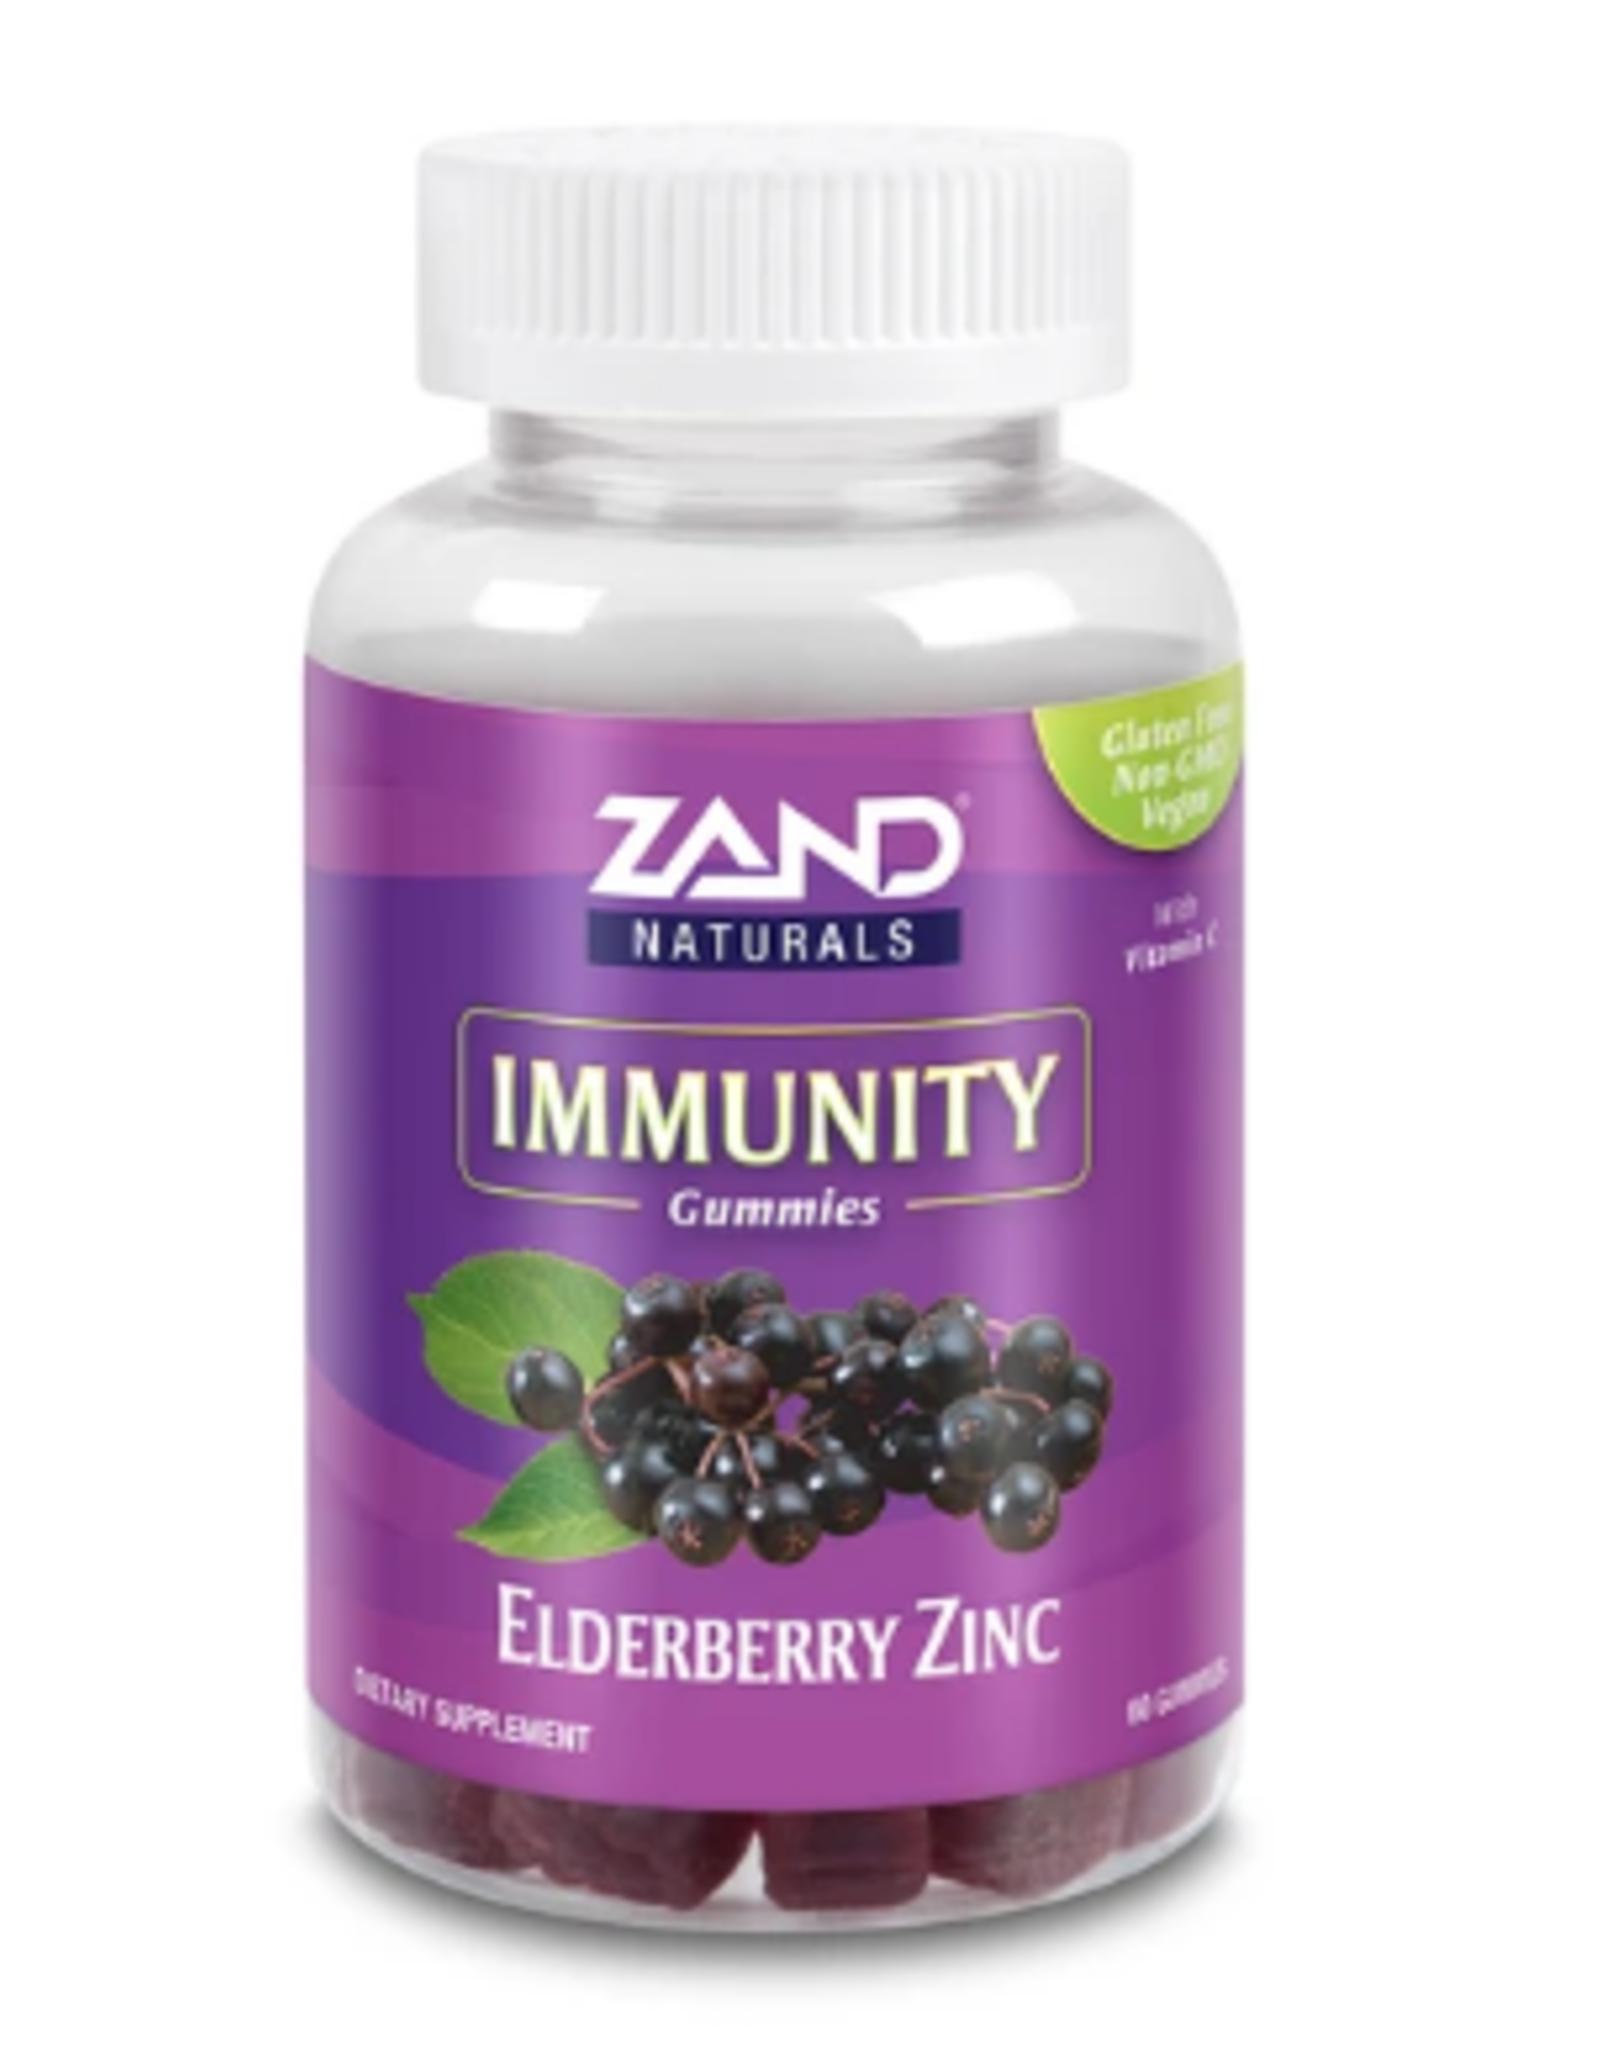 Zand Naturals Elderberry Zinc Immunity Gummies - 60